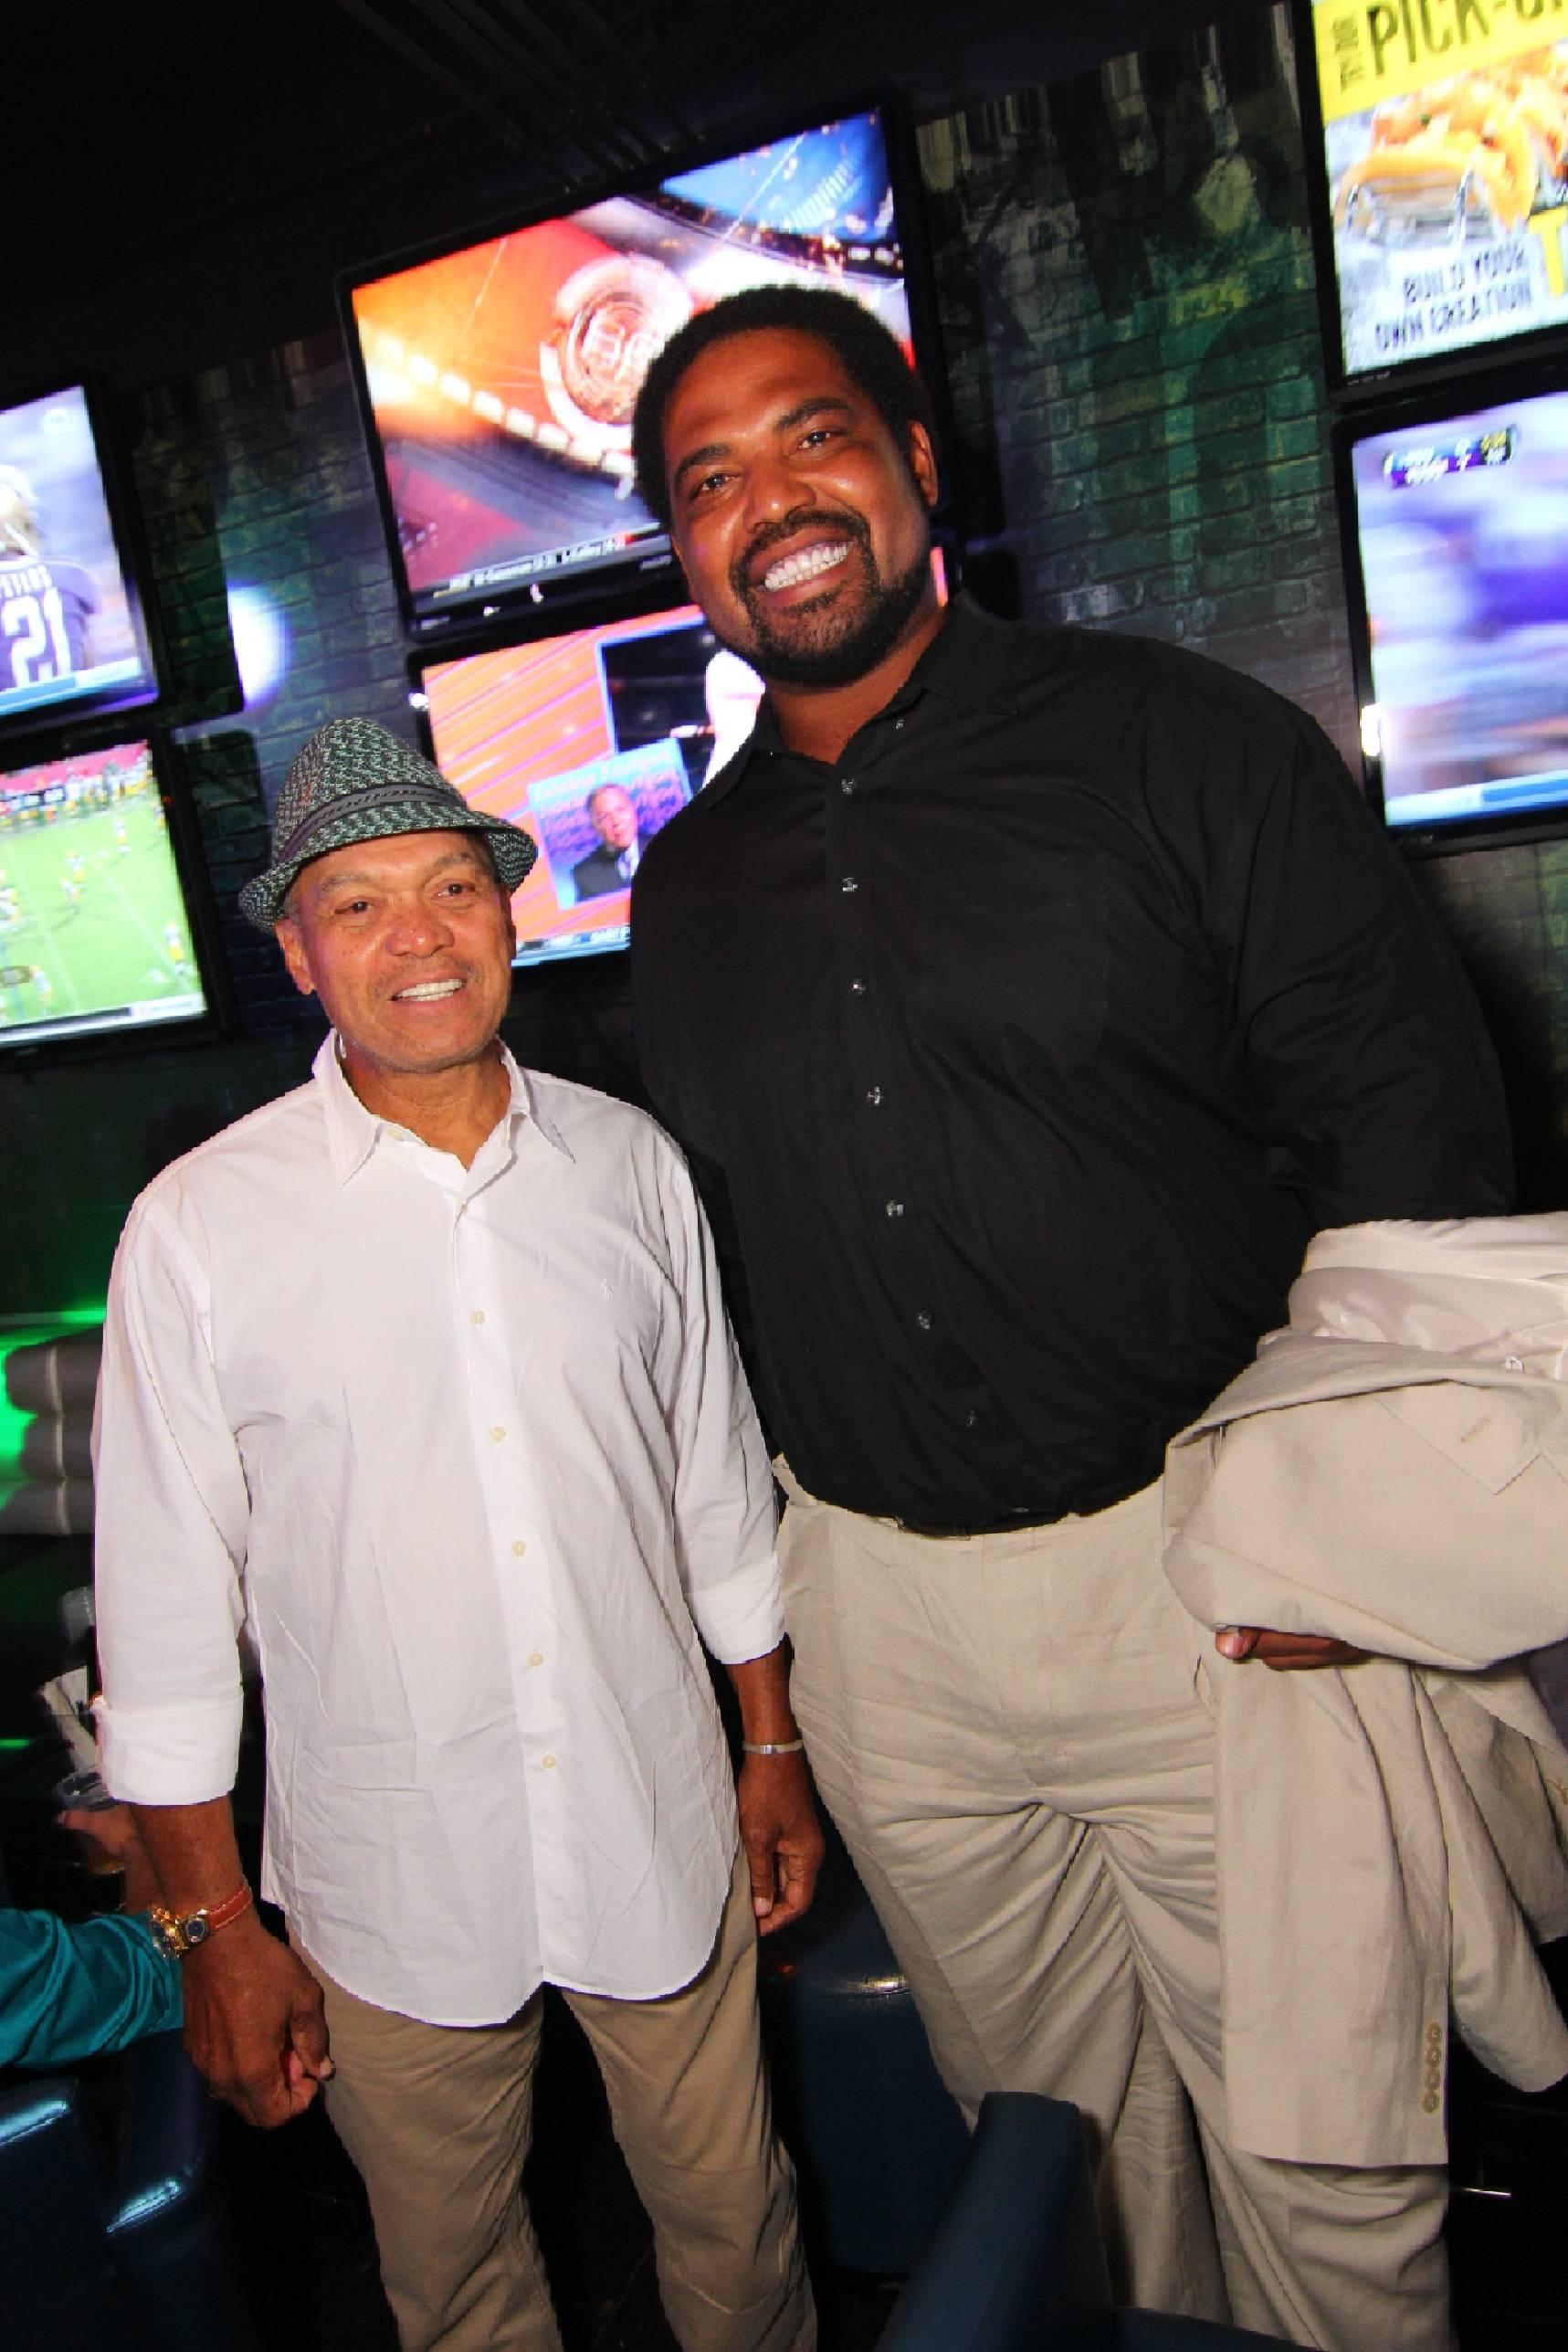 Reggie Jackson and Jonathan Ogden Celebrate at Rockhouse